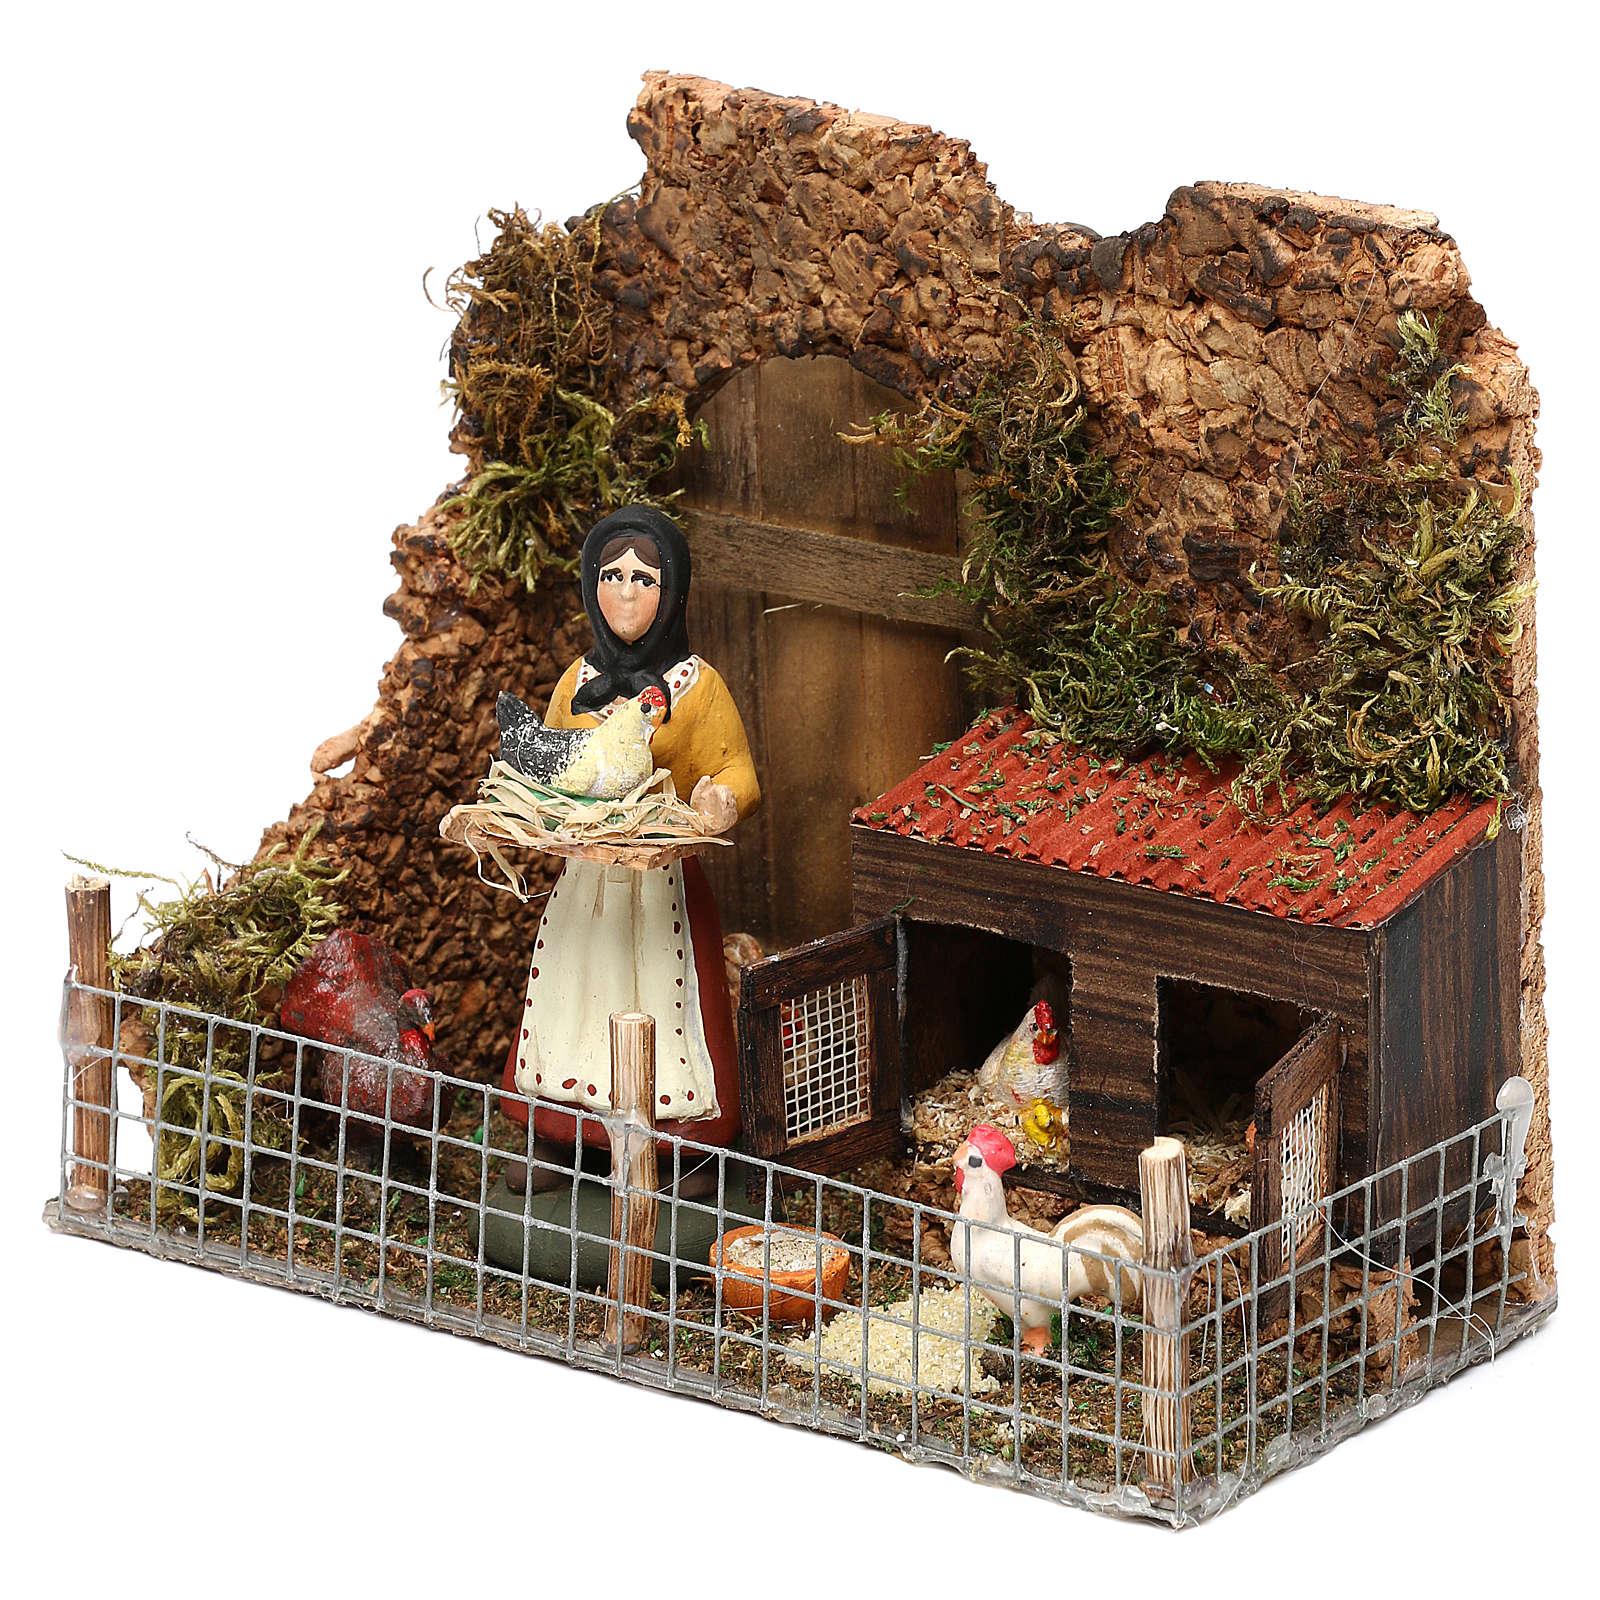 Woman in the henhouse for Neapolitan Nativity scene 8 cm 4